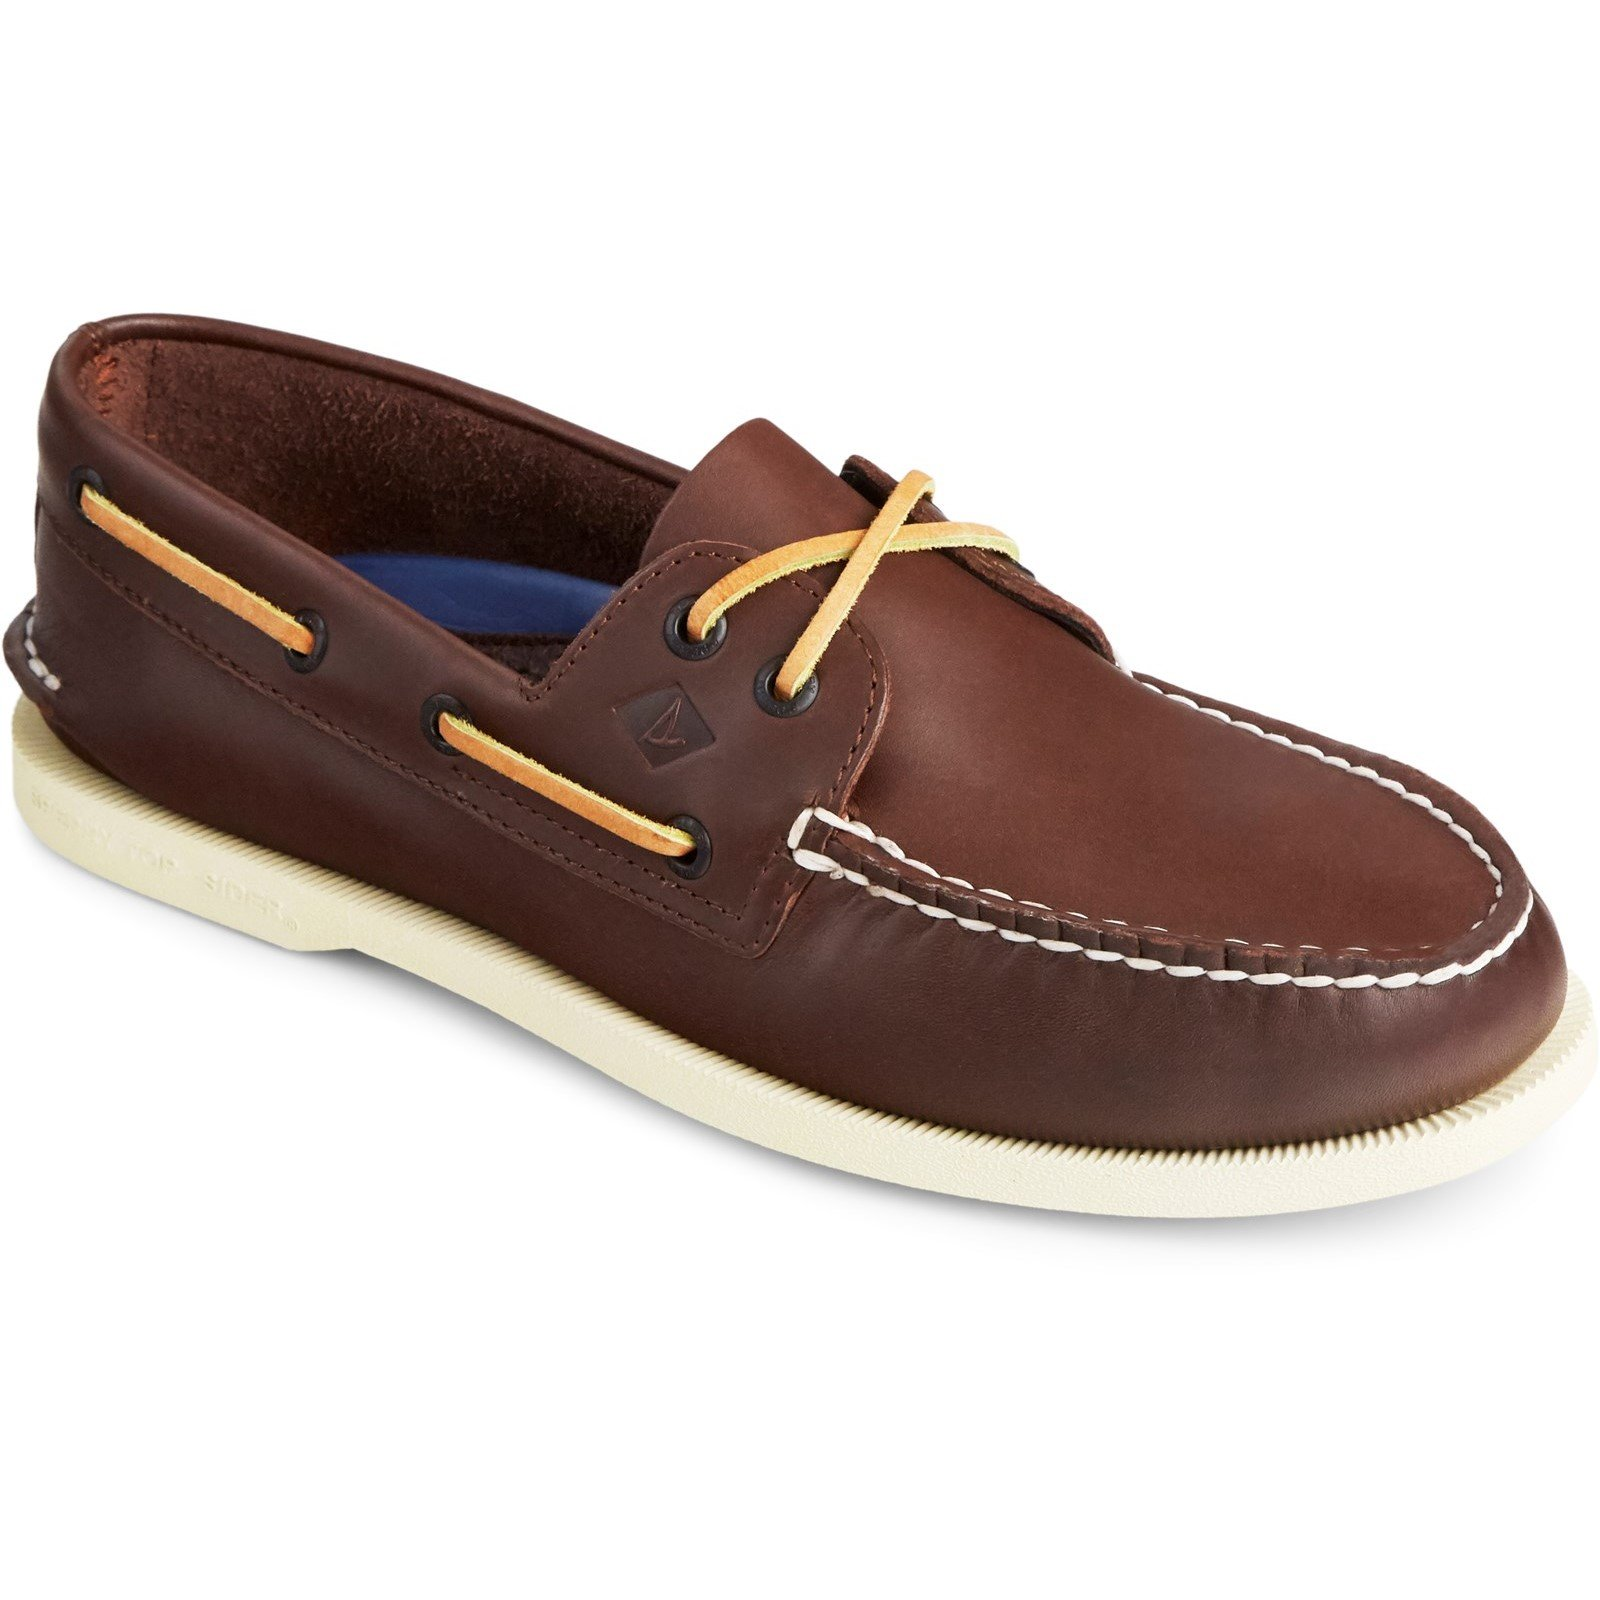 Sperry Men's Authentic Original Leather Boat Shoe Various Colours 31524 - Brown 8